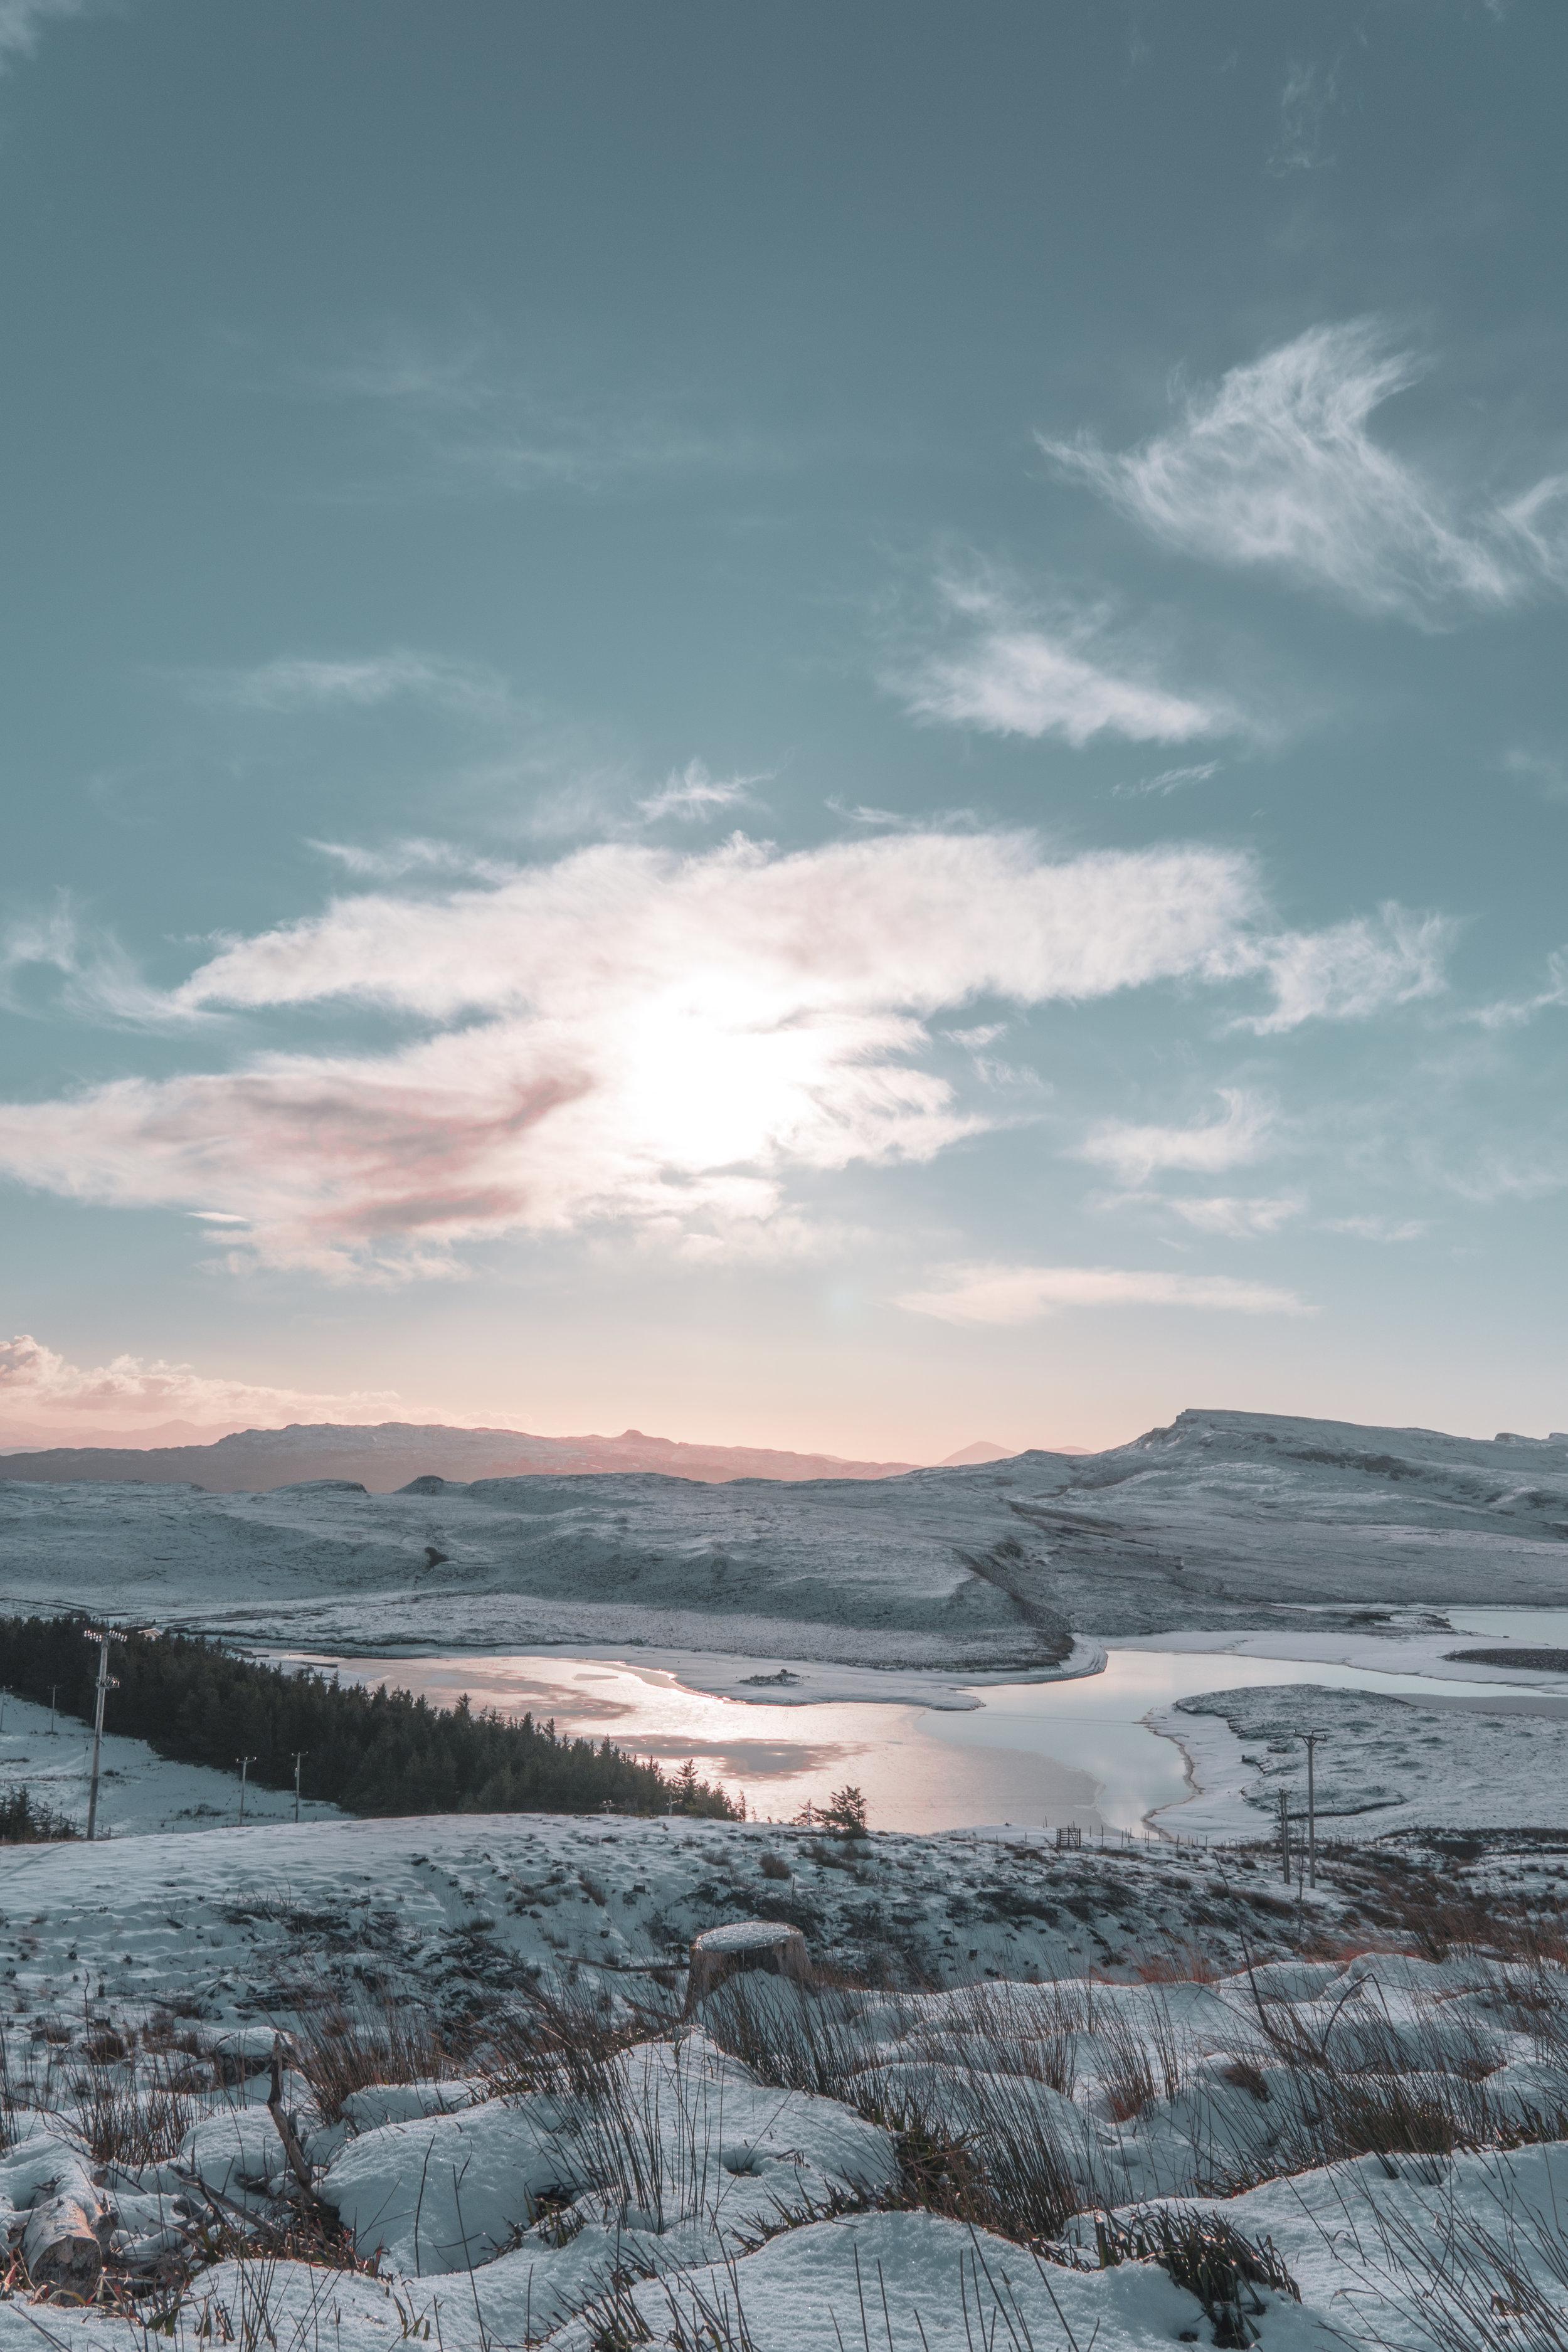 Isle-of-Skye-Winter-2019-Trotternish (16).jpg